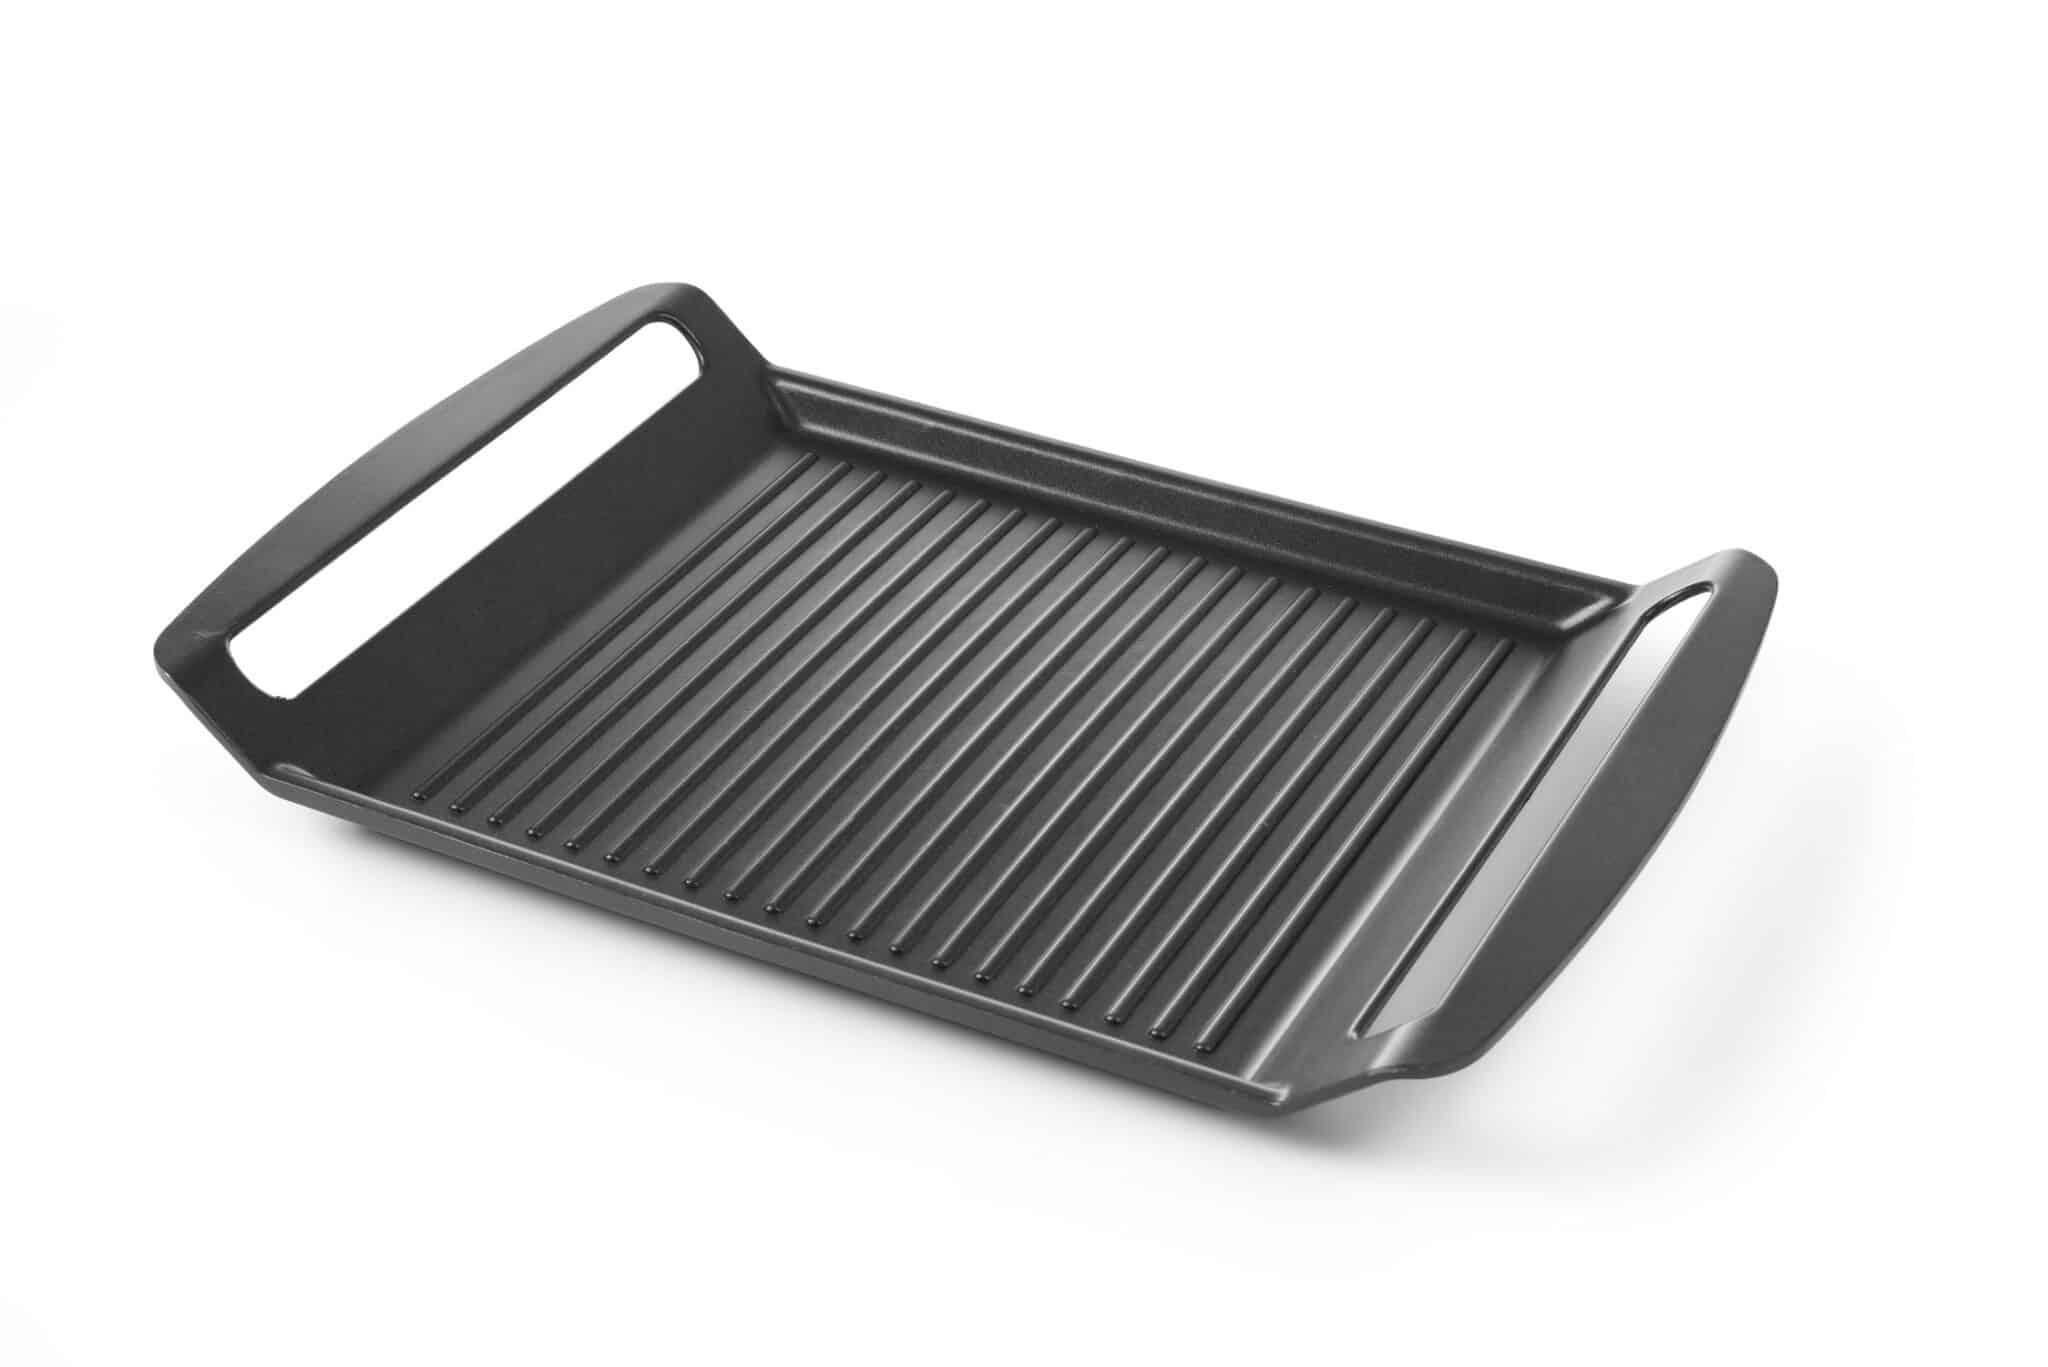 hendi gastro induktion grill pfanne grill platte f r. Black Bedroom Furniture Sets. Home Design Ideas